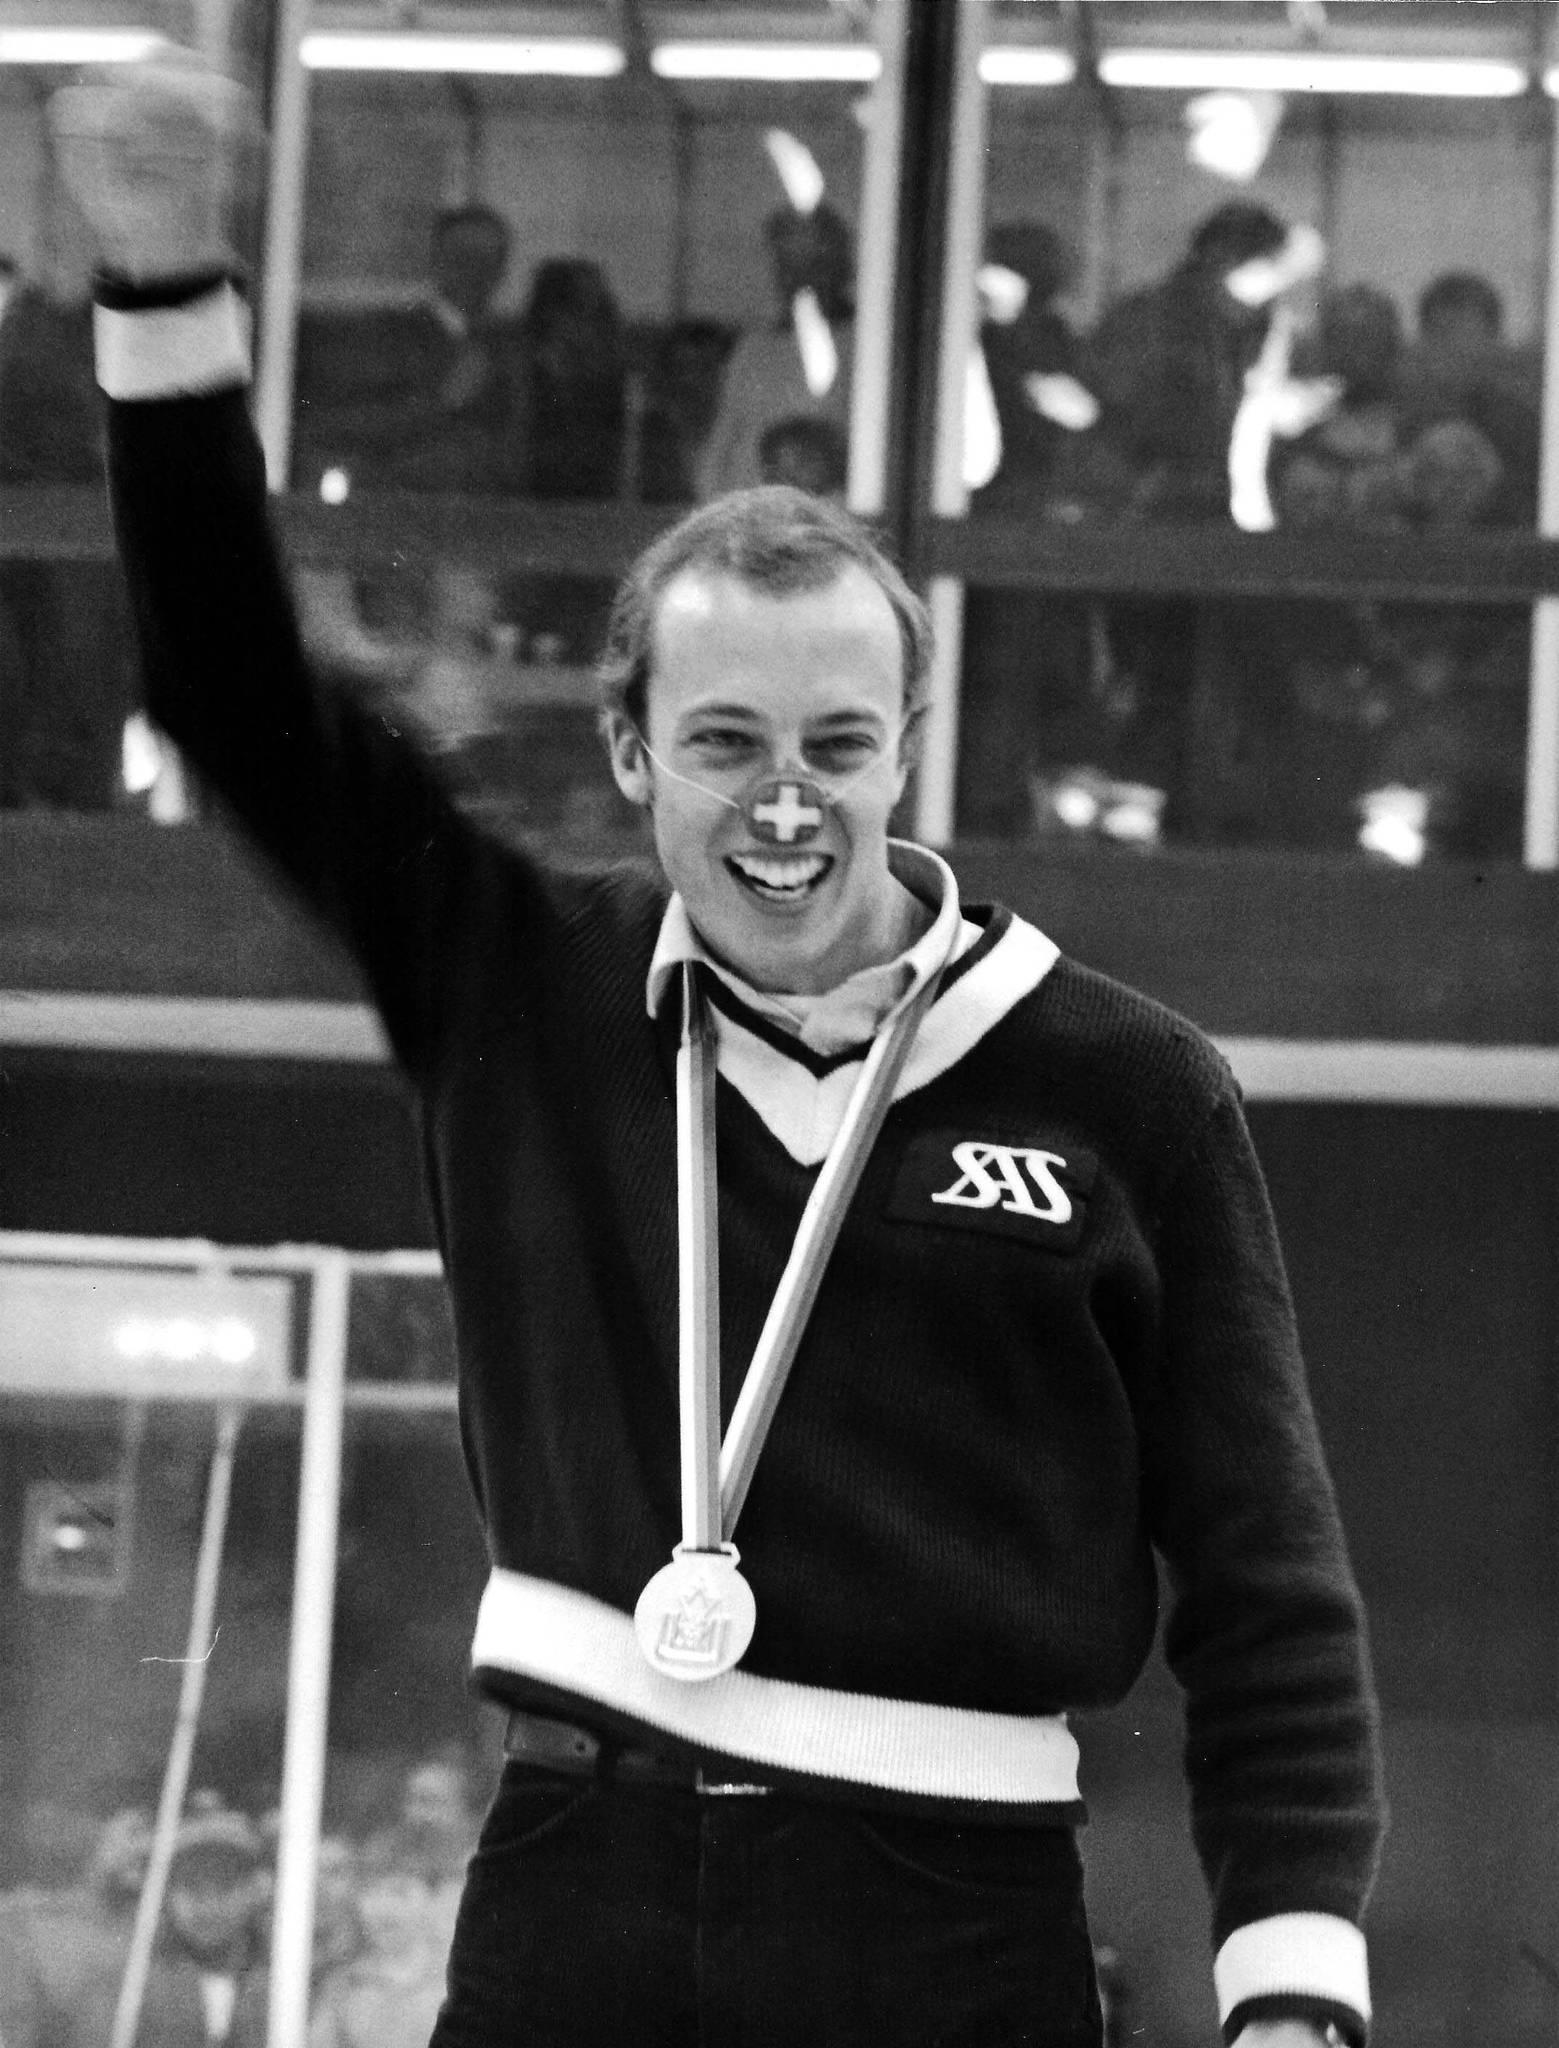 1983 in sports